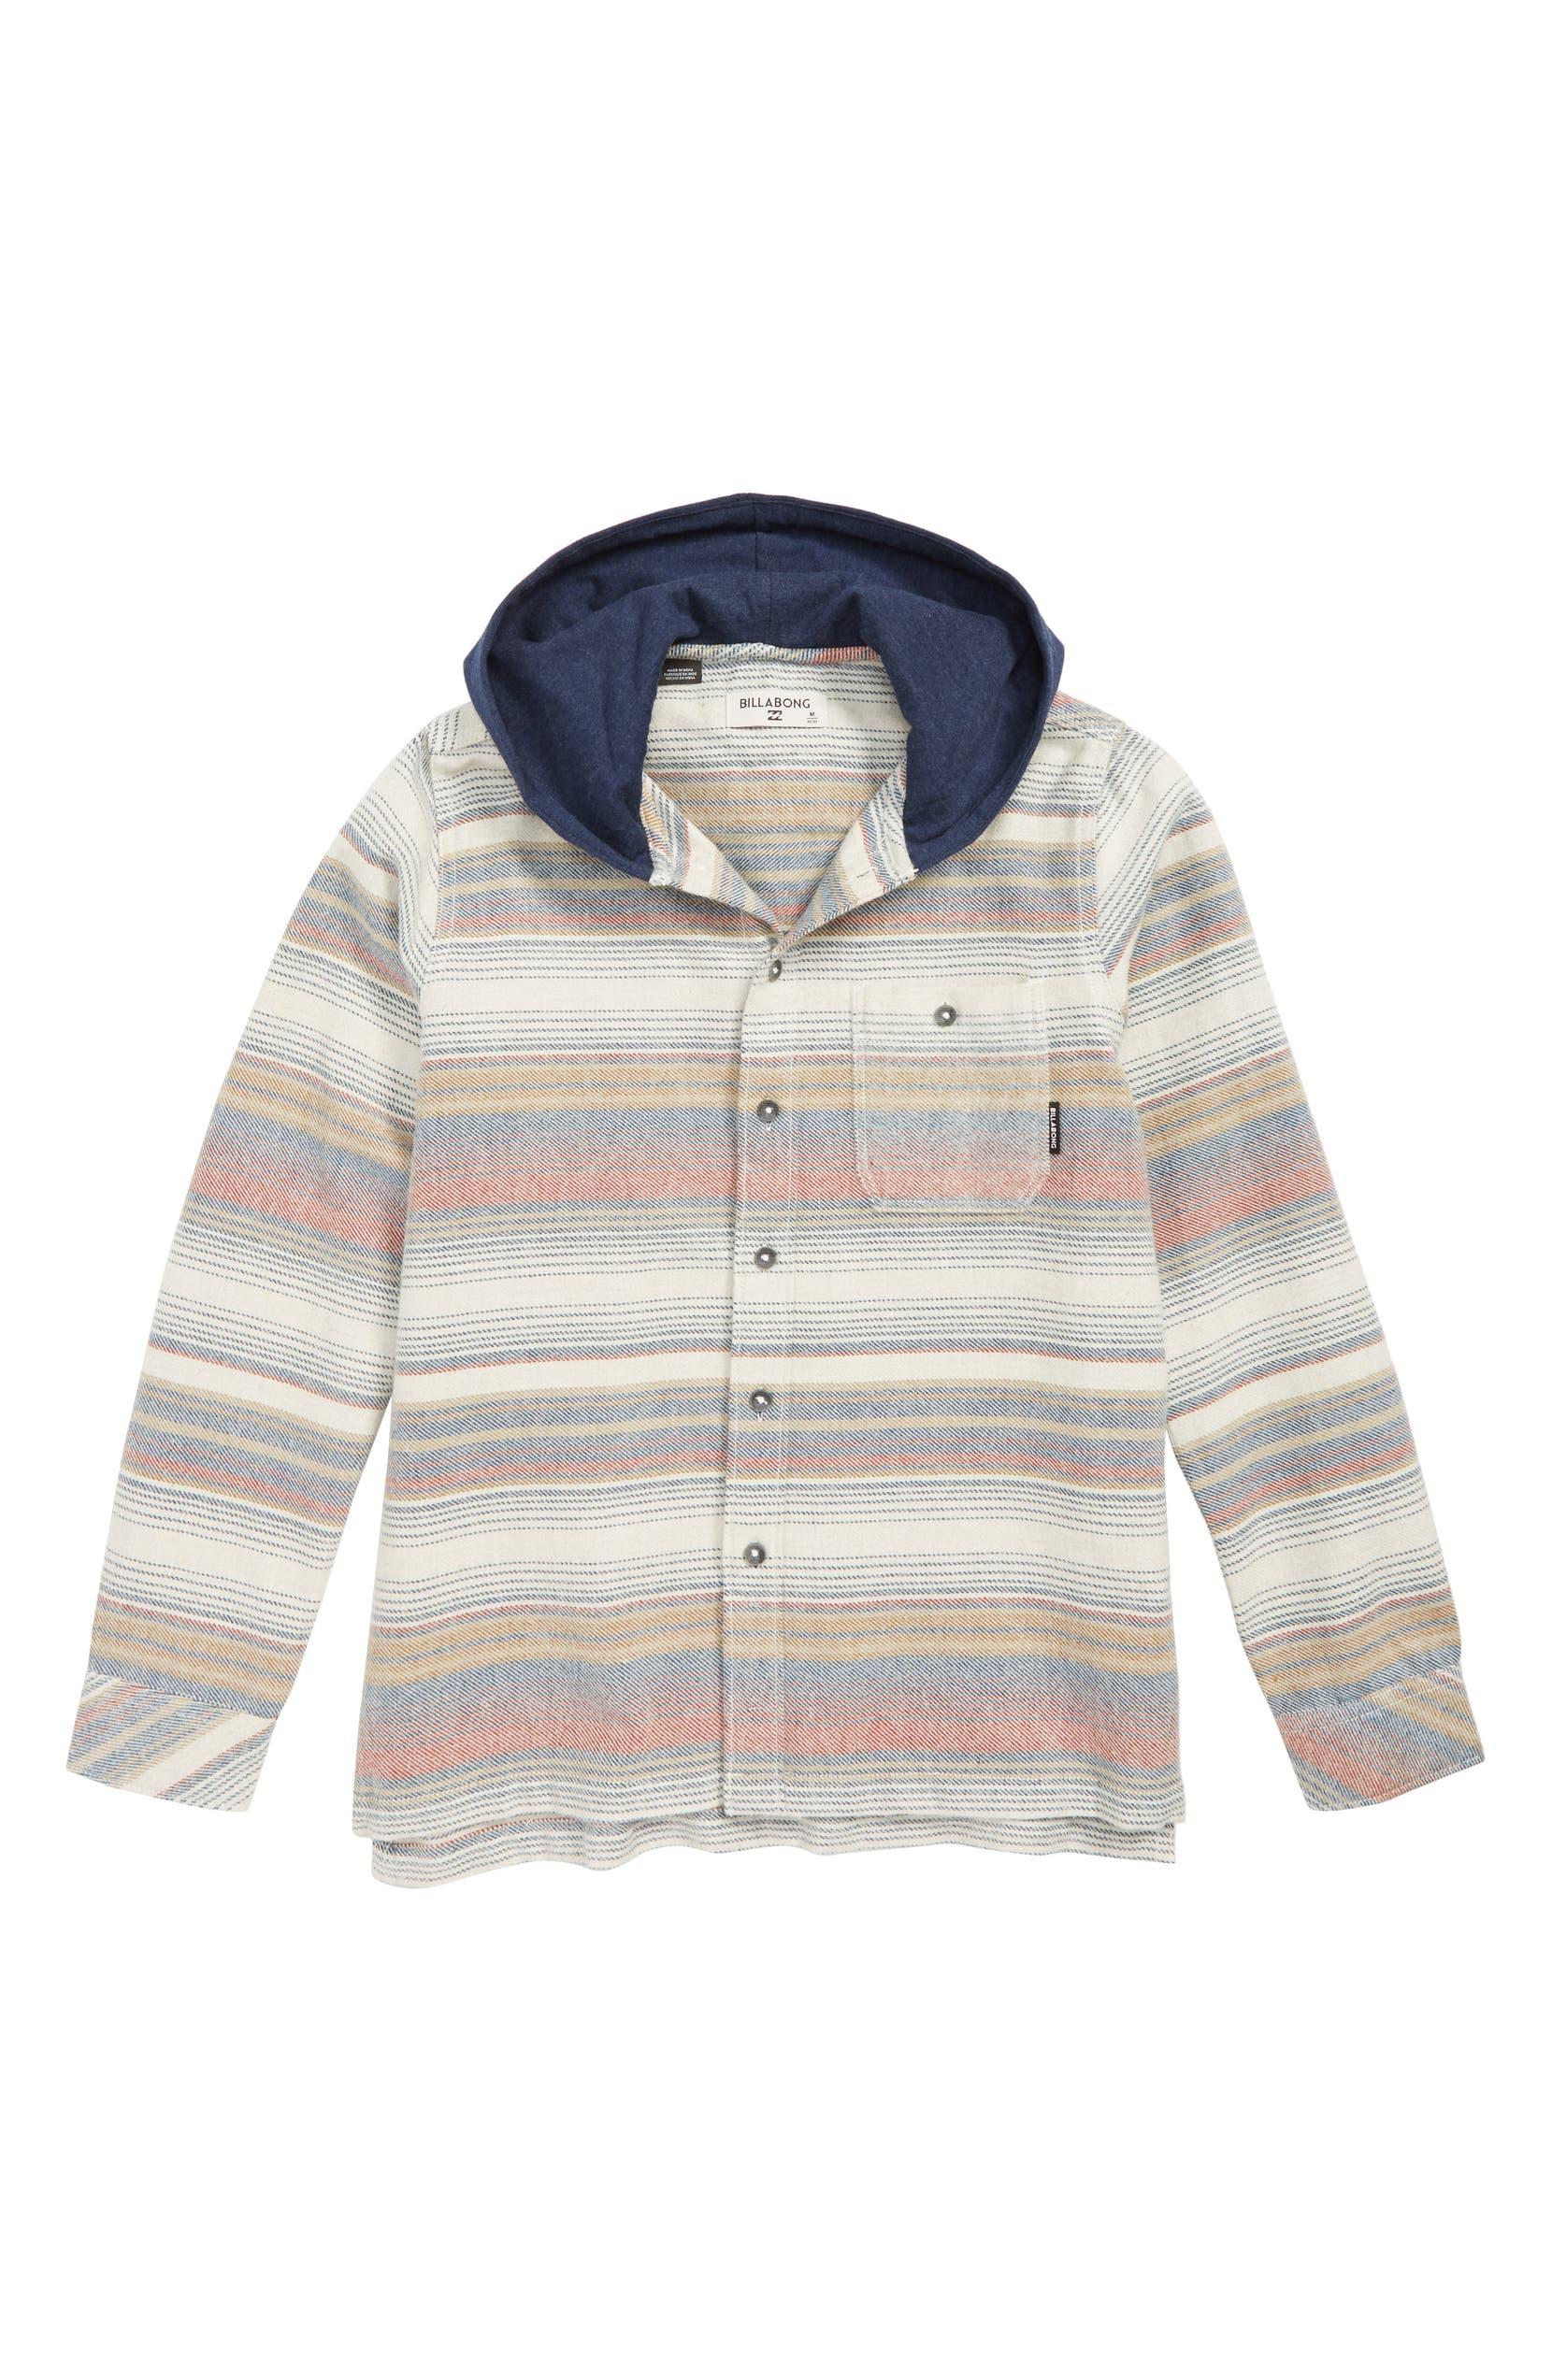 003c9e11986c82 Billabong Baja Hooded Flannel Shirt (Big Boys)